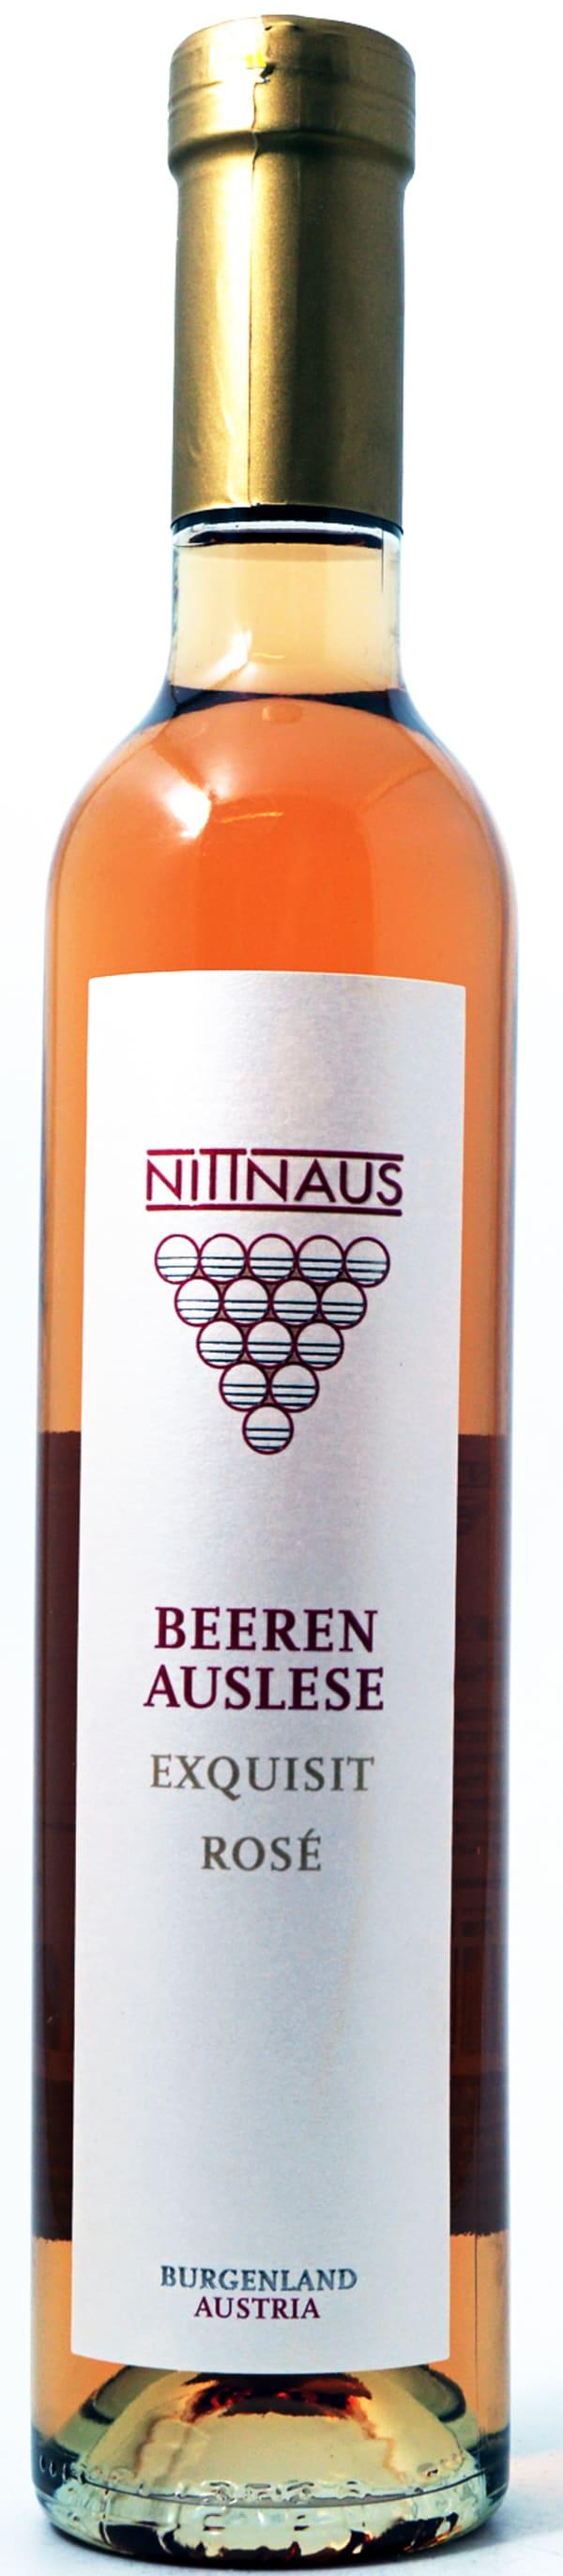 Nittnaus Beerenauslese Rosé Exquisit 2015